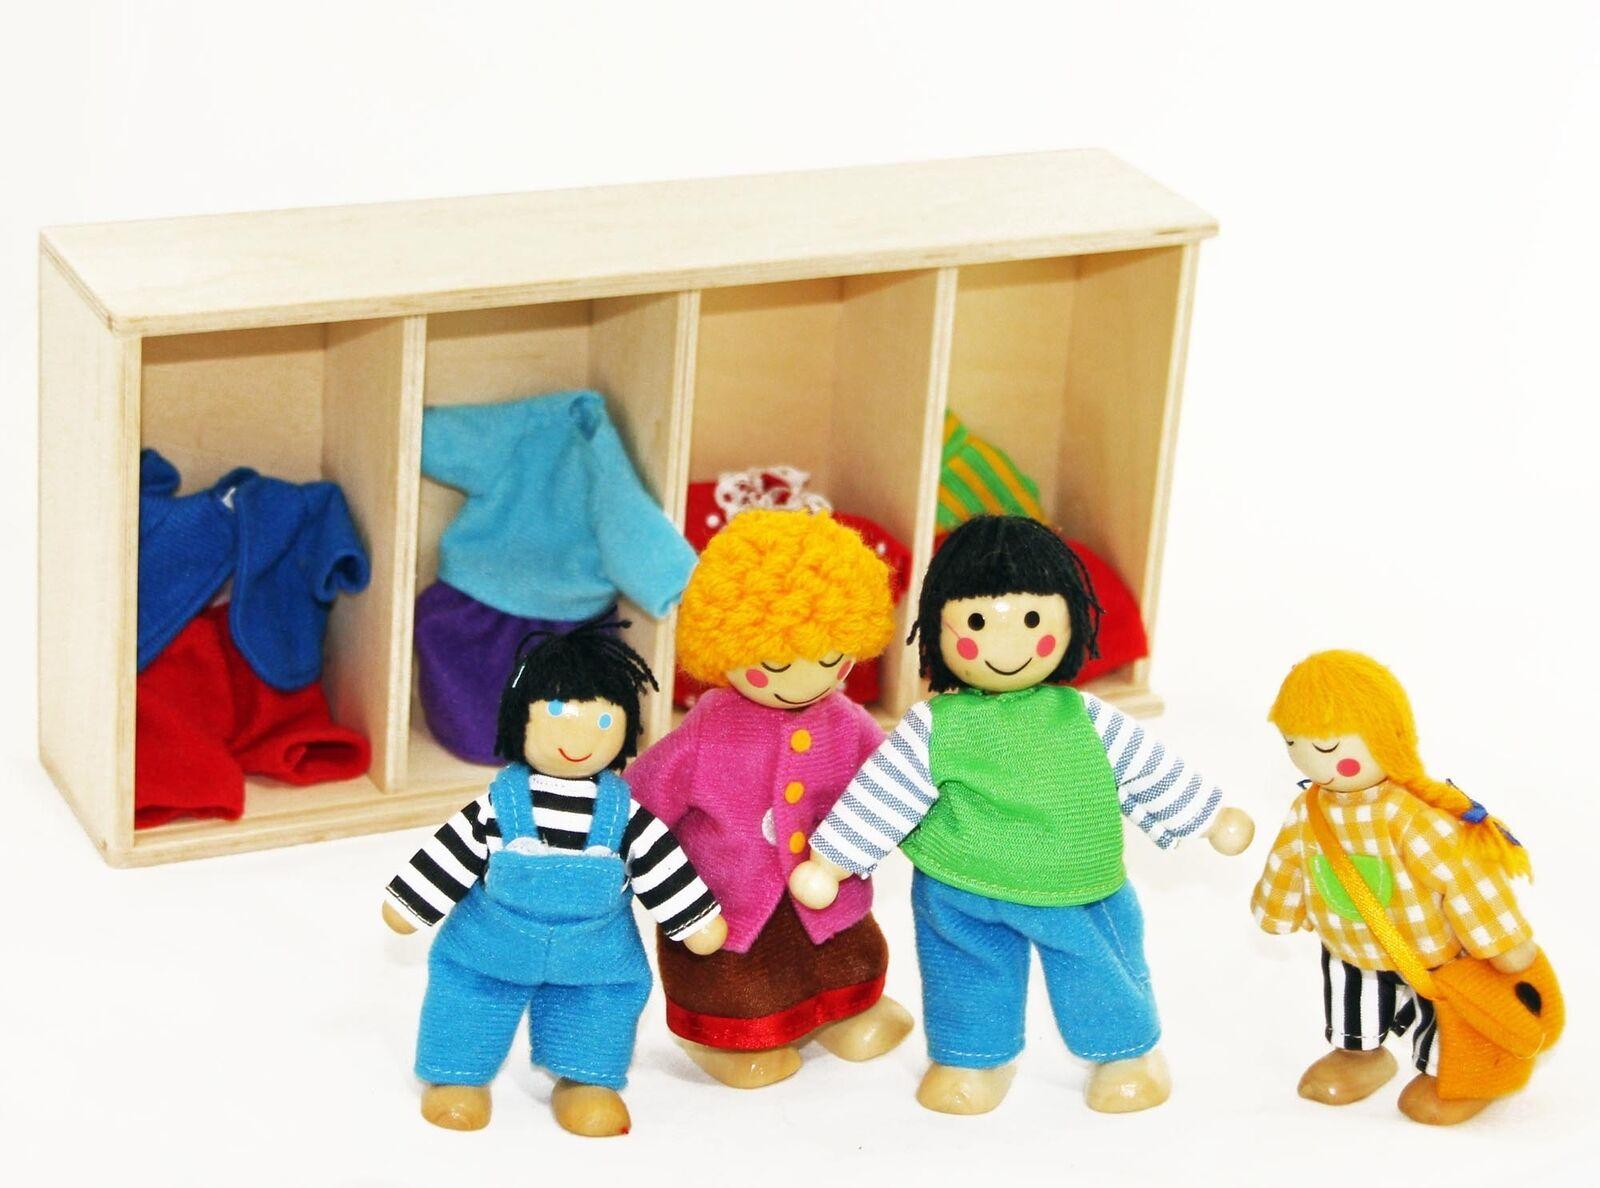 Frota Puppenhaus + Puppenhausmöbel Puppenmöbel 28 Teile Teile Teile + Familie + Hussen b77059